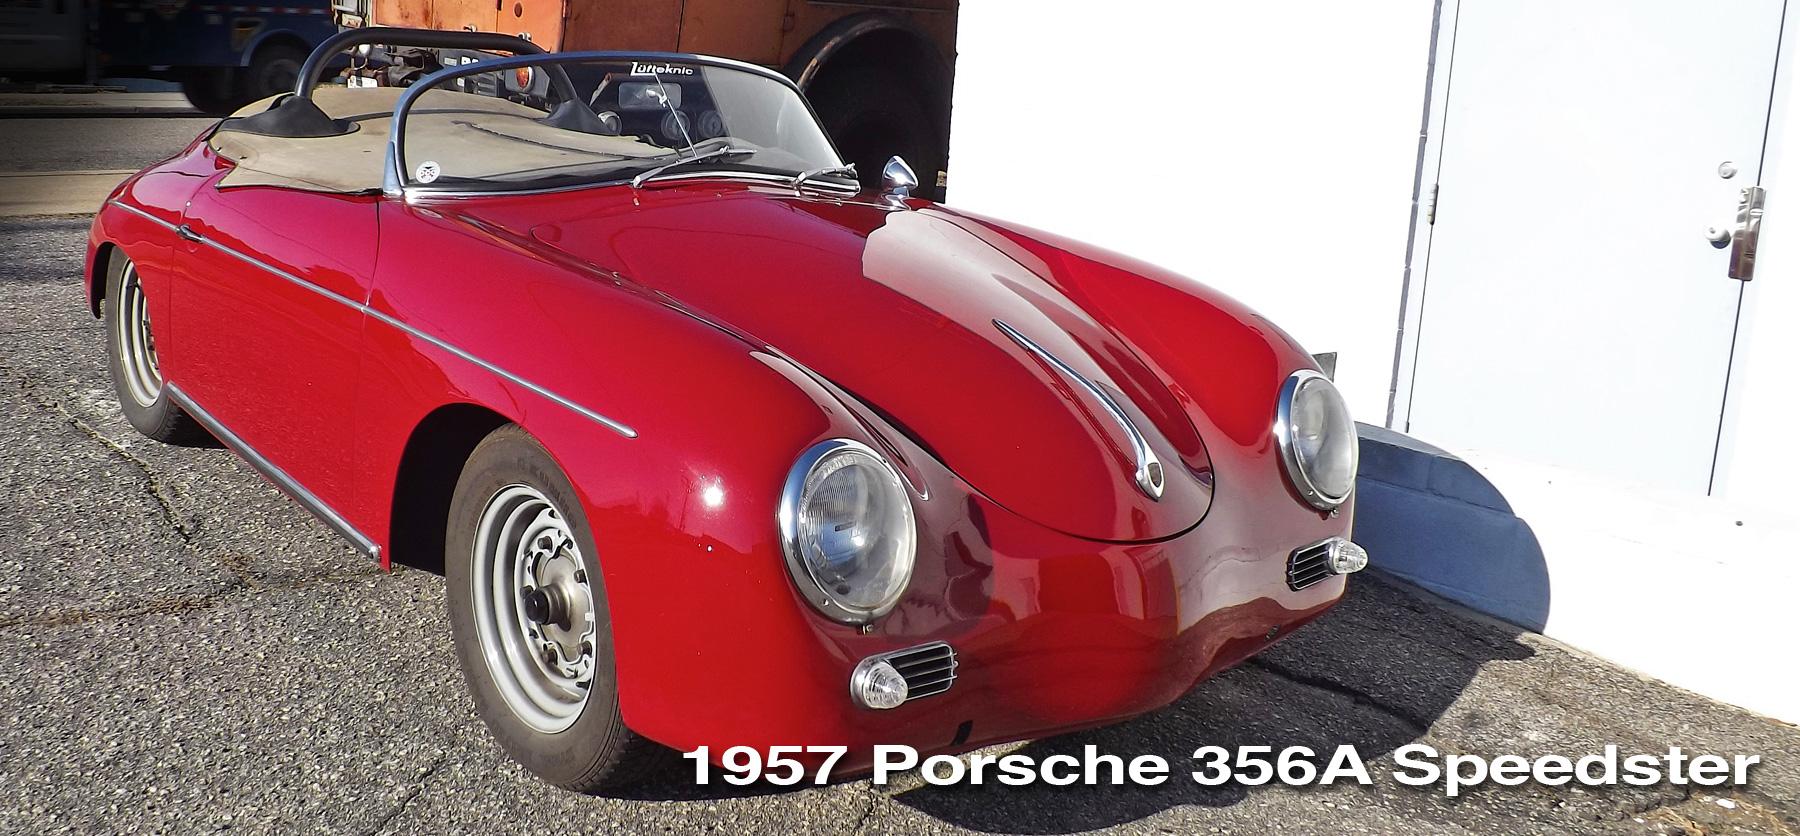 Red 1957 Porsche 356A Speedster header image